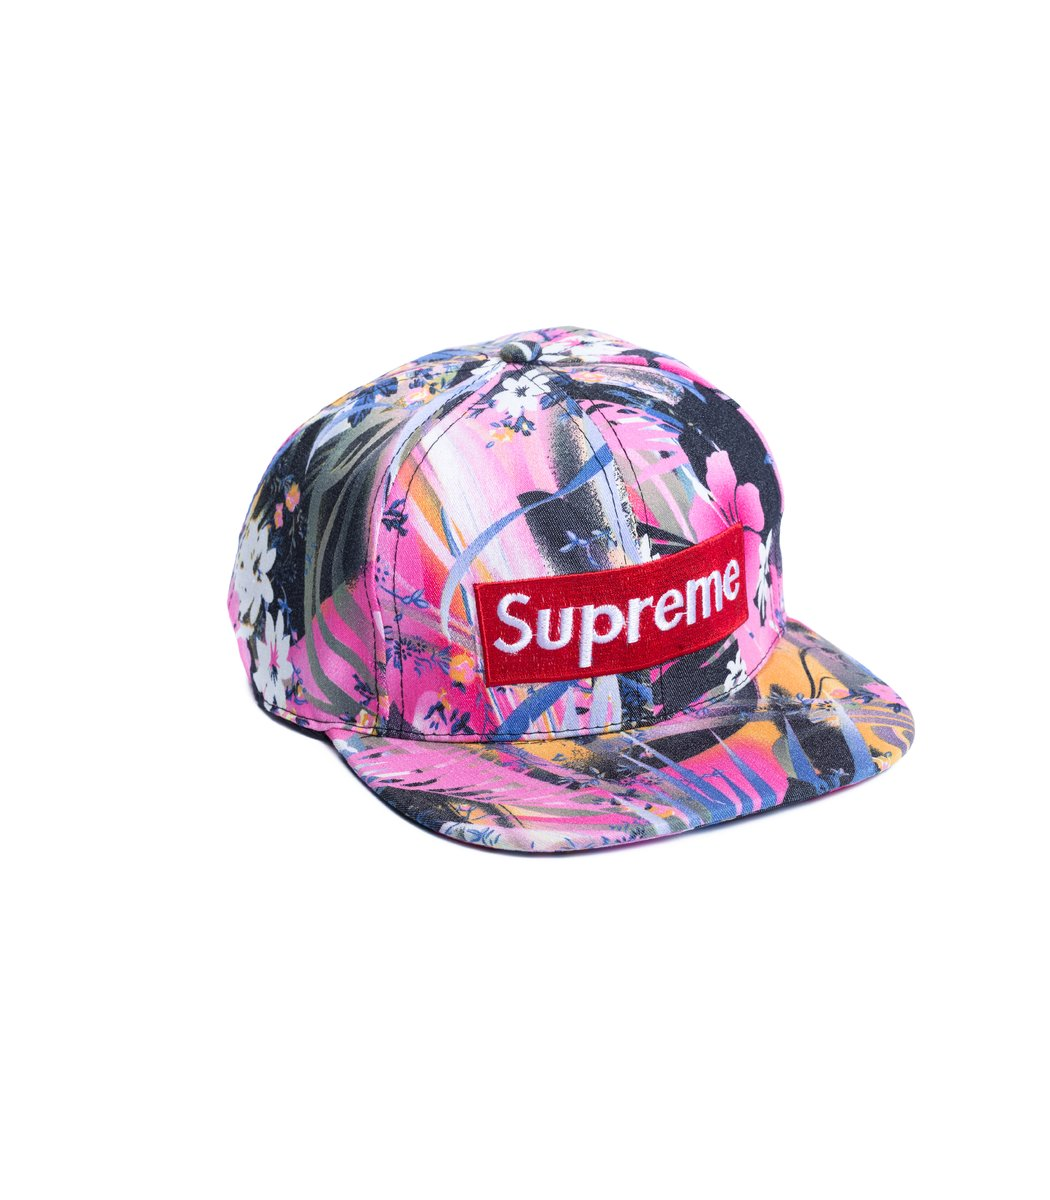 Бейсболка  Supreme Tropic Розовый